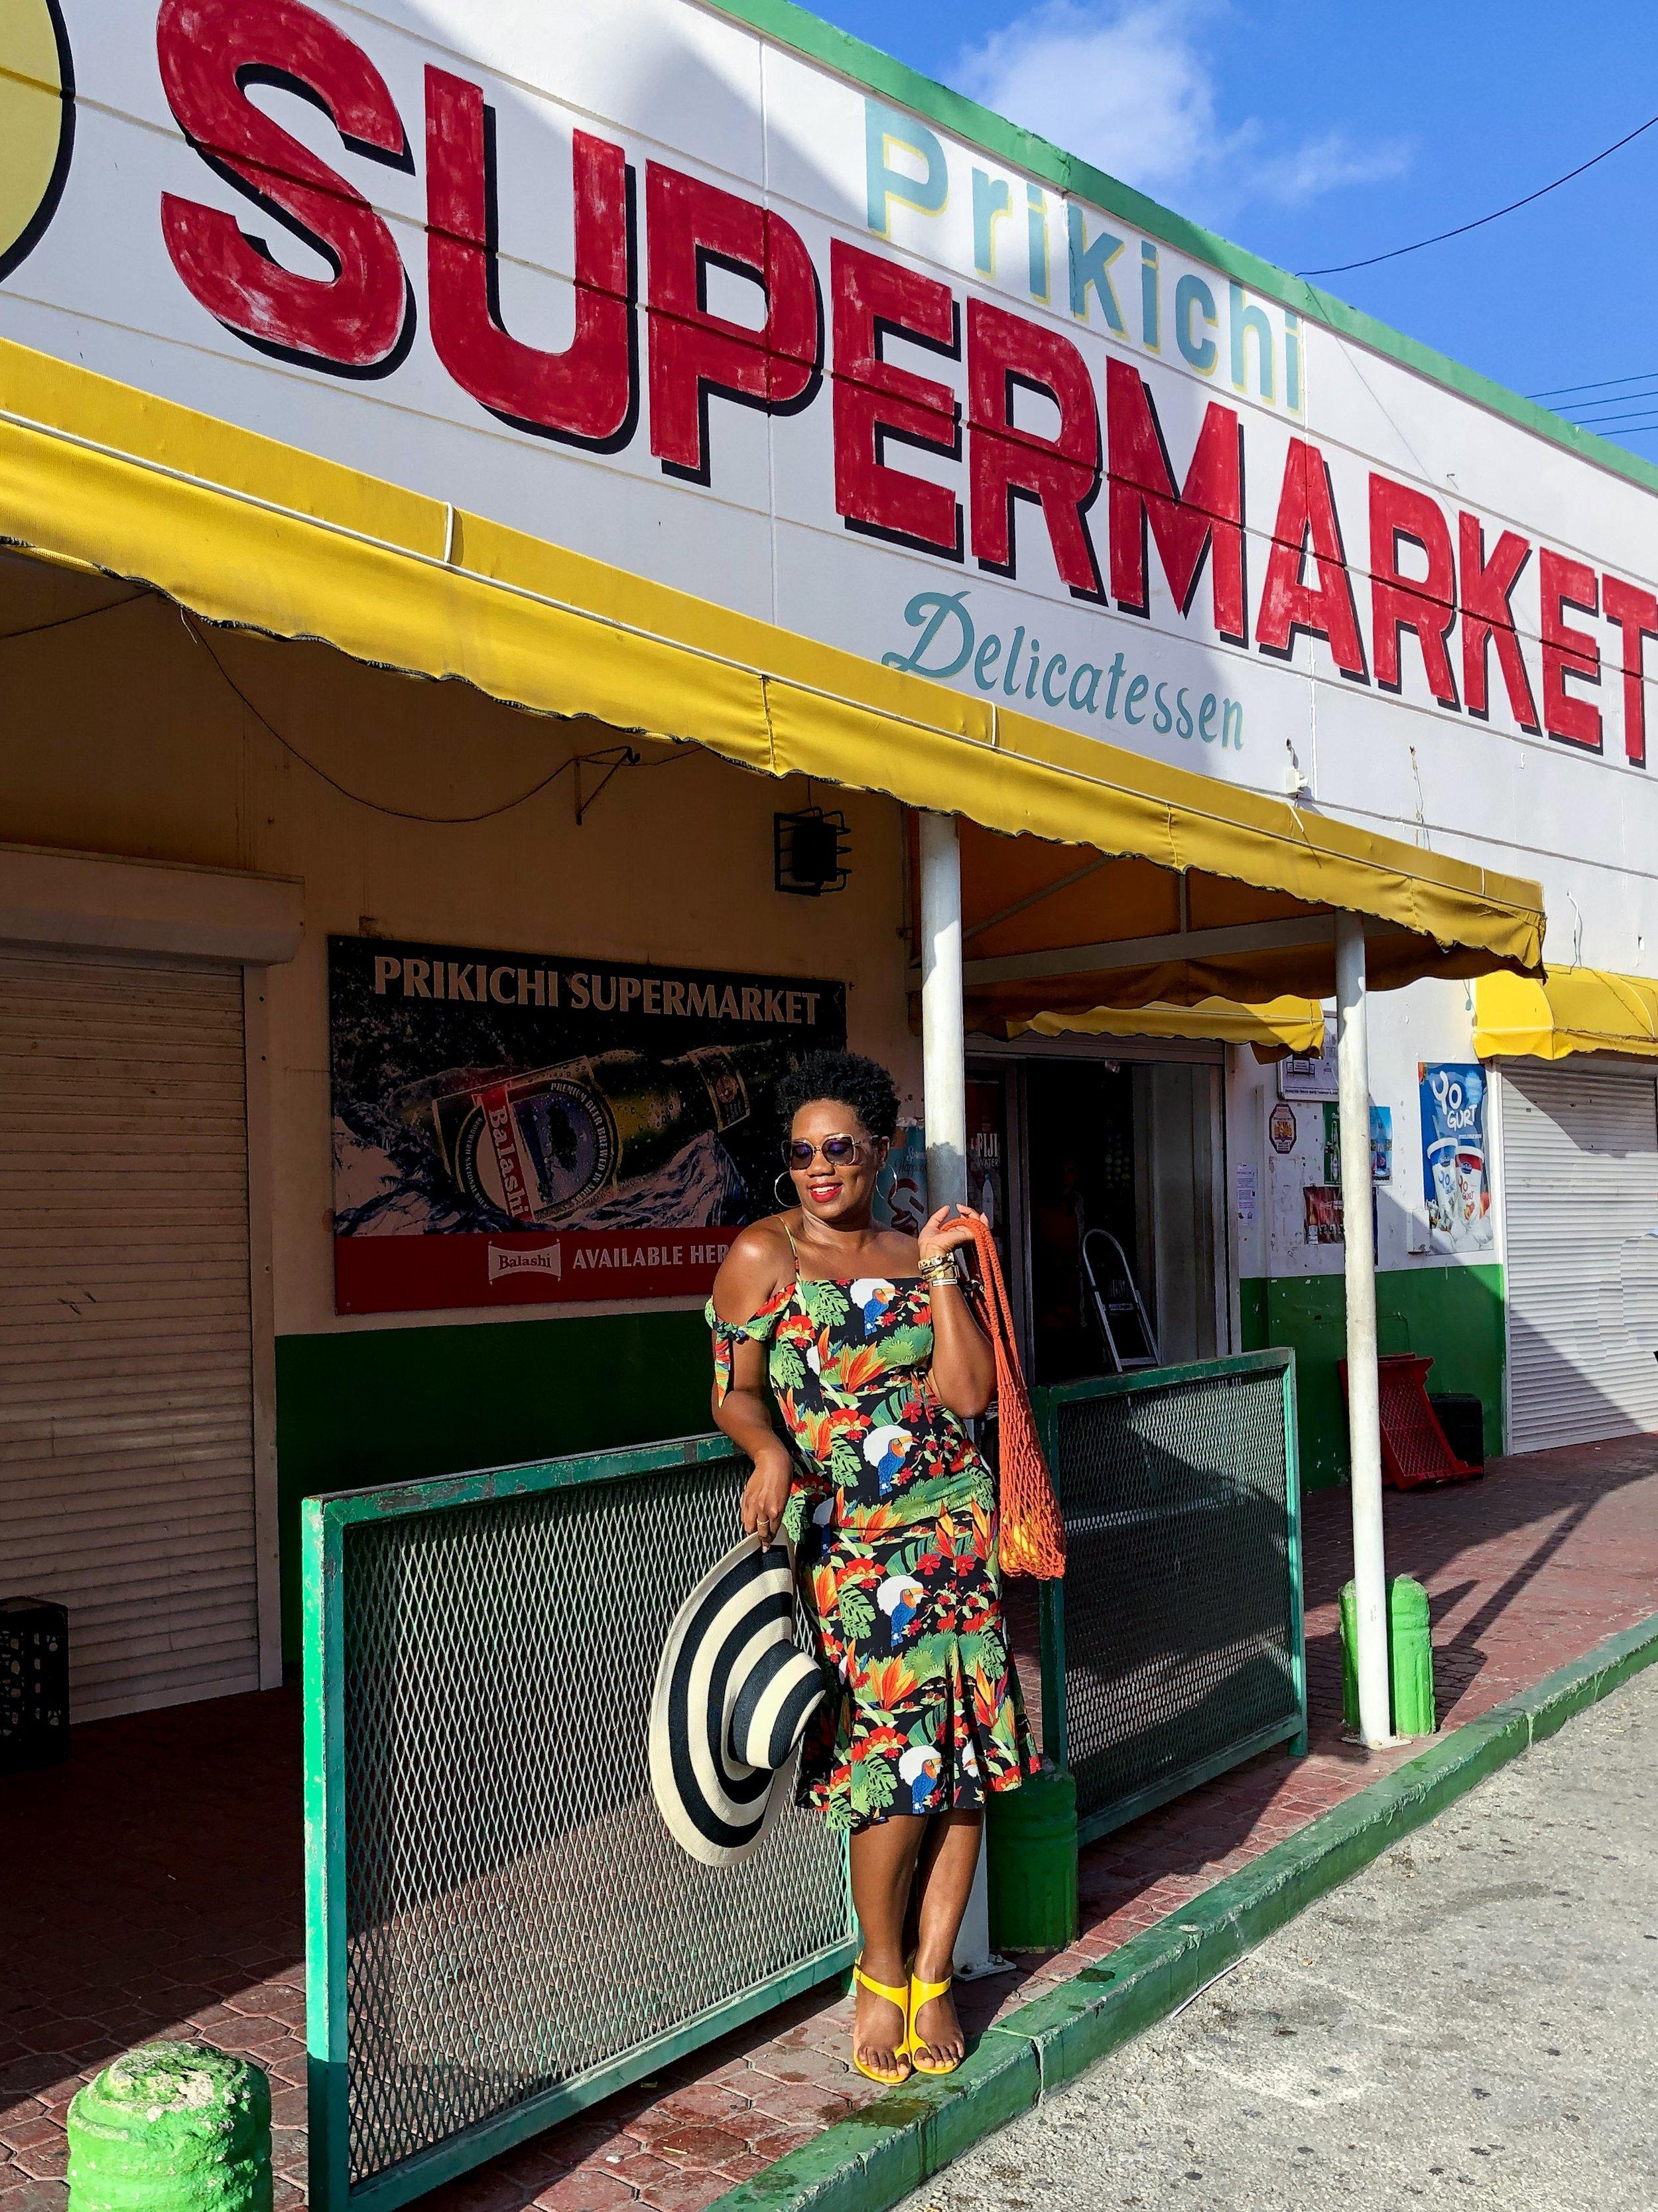 Shop my look:   Black Tropical Print Dress     Crocheted Handbag       Striped Straw Hat       Yellow Sandals